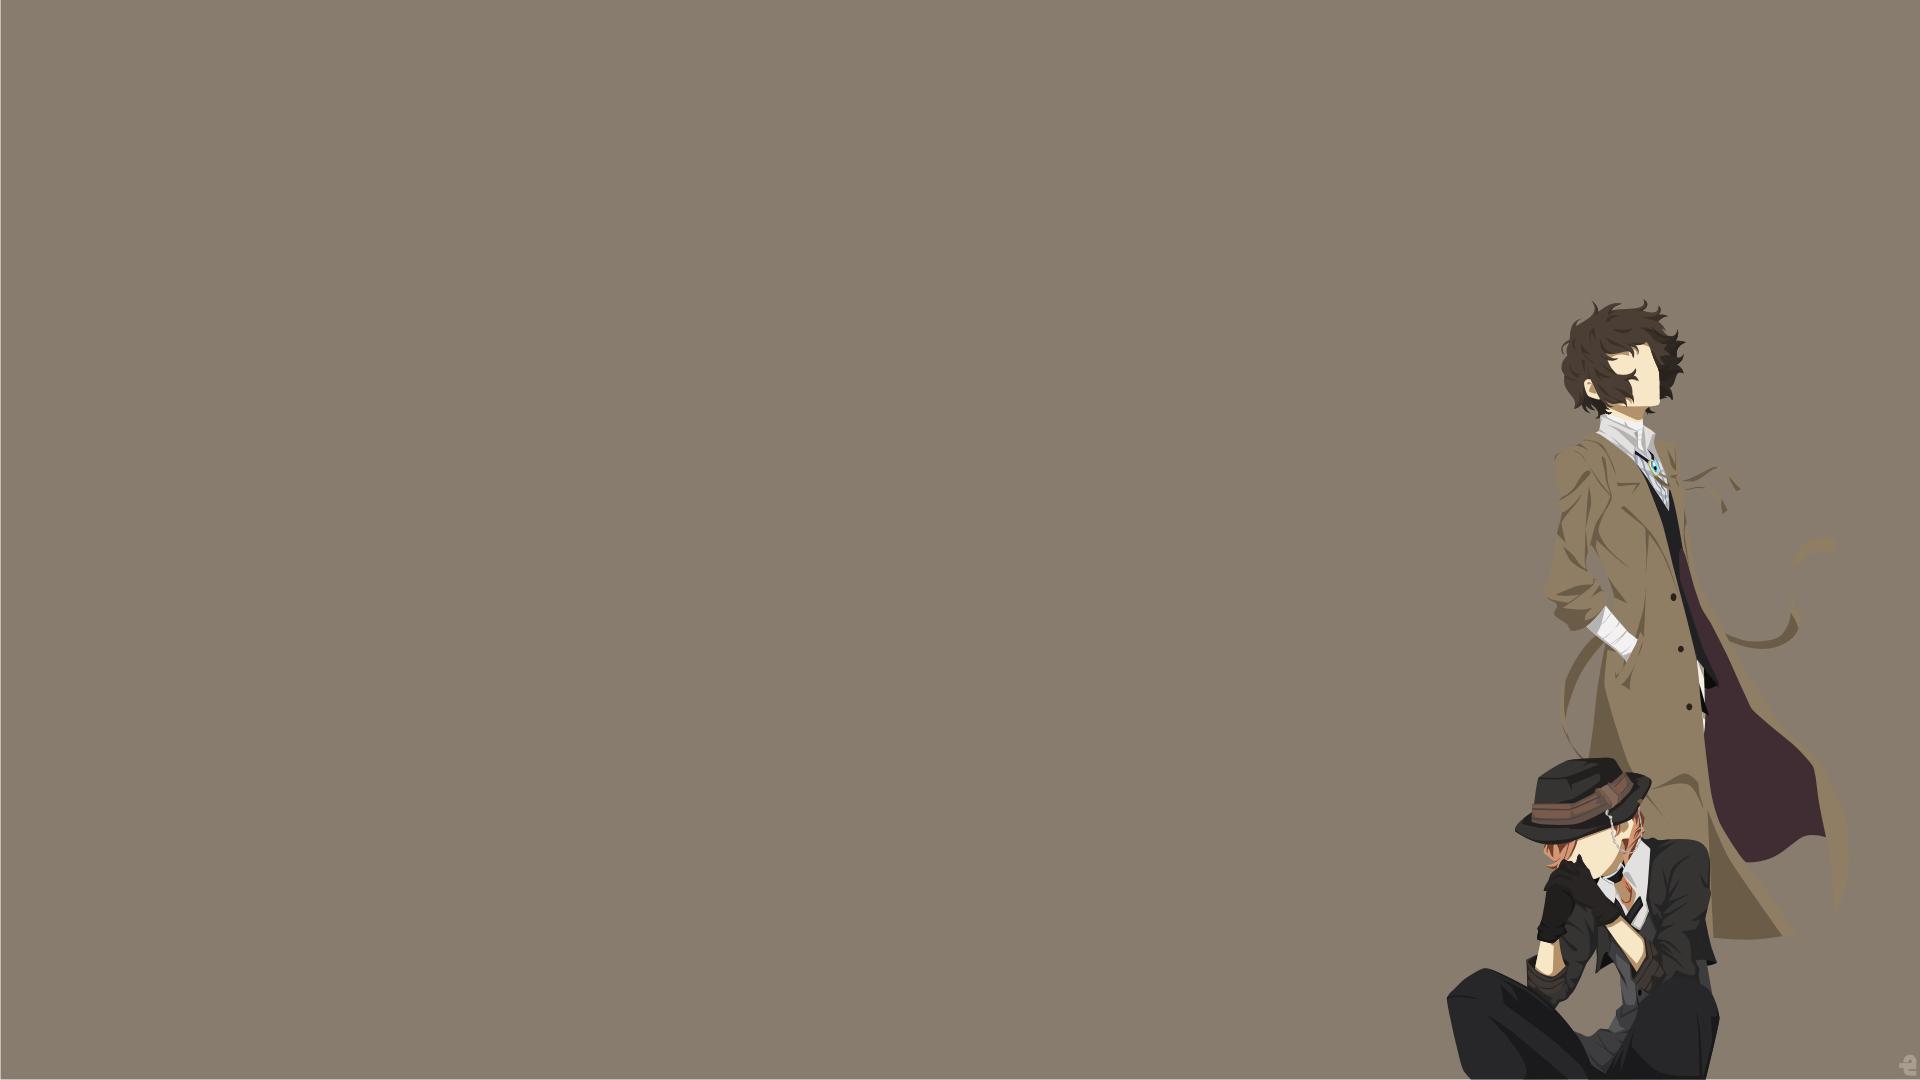 Minimalist Iphone X Wallpaper Hd Double Black Bungou Stray Dogs 高清壁纸 桌面背景 1920x1080